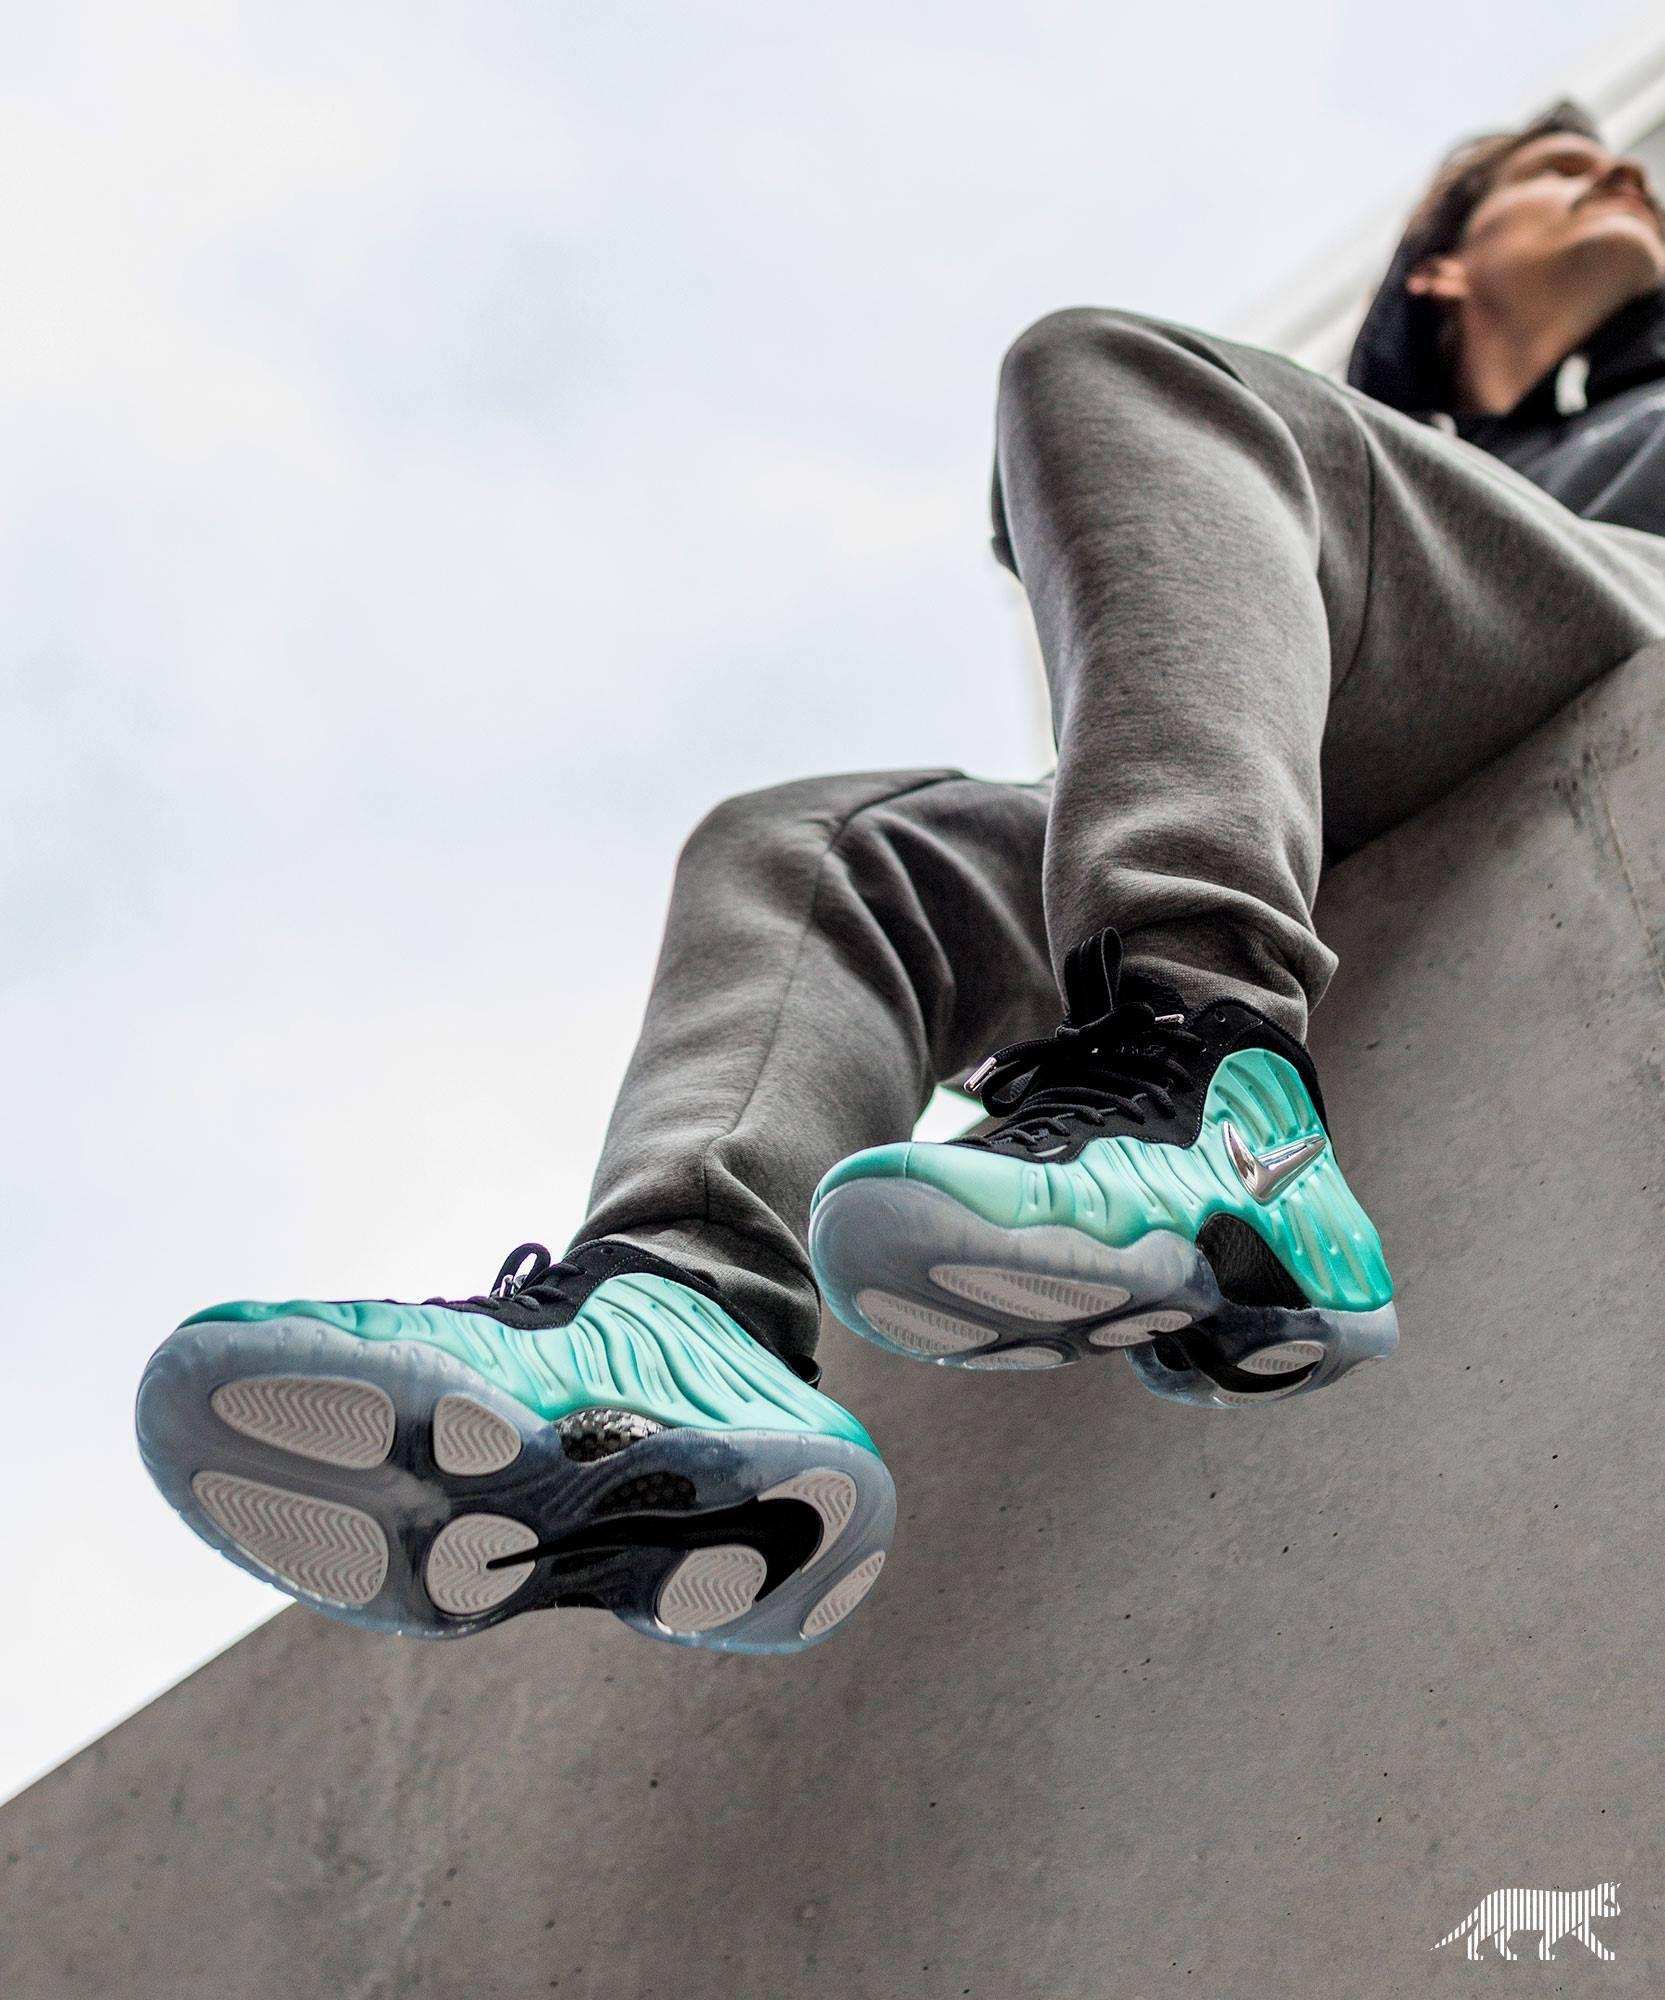 9a2863f6a720 Nike Basketball Shoes · Nike Air Foamposite Pro